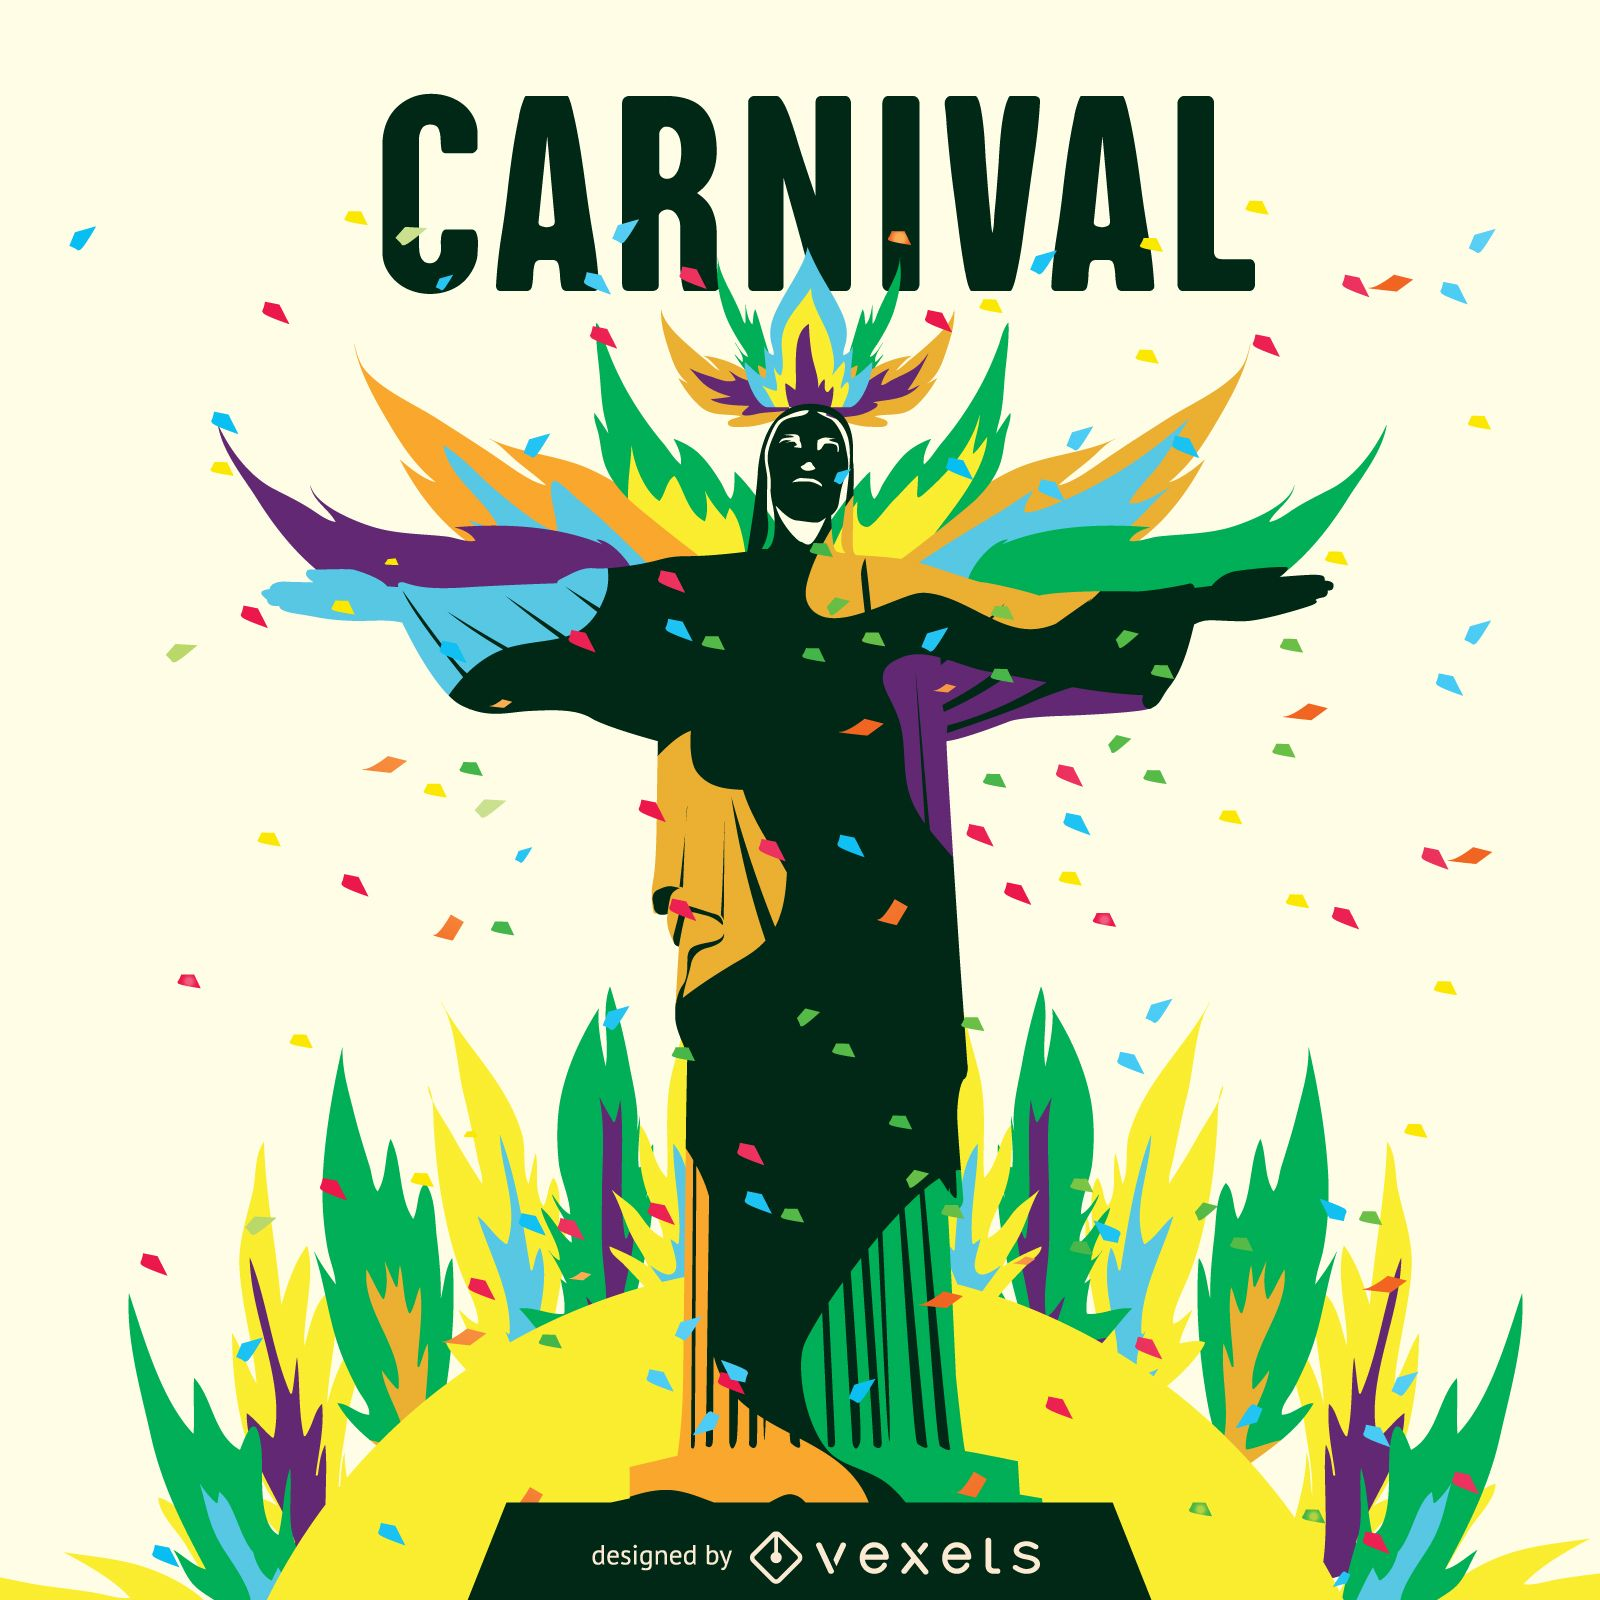 Rio carnival illustration